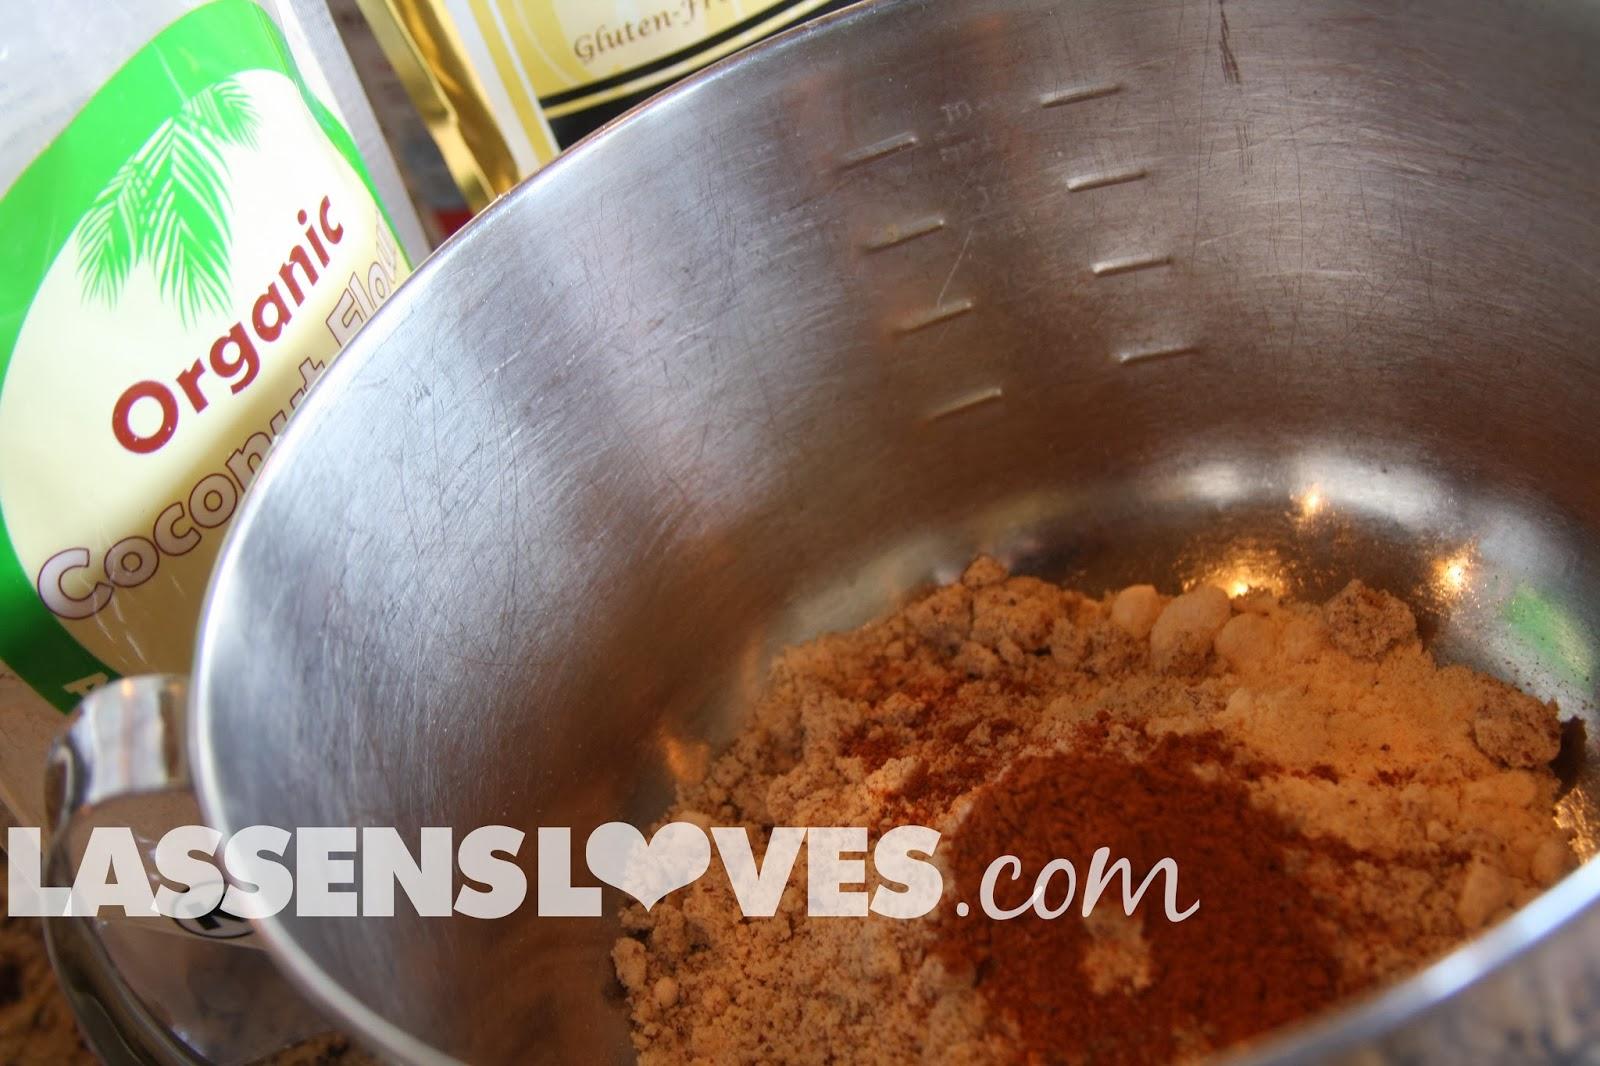 lassensloves.com, Lassen's, pumpkin+muffins, gluten+free